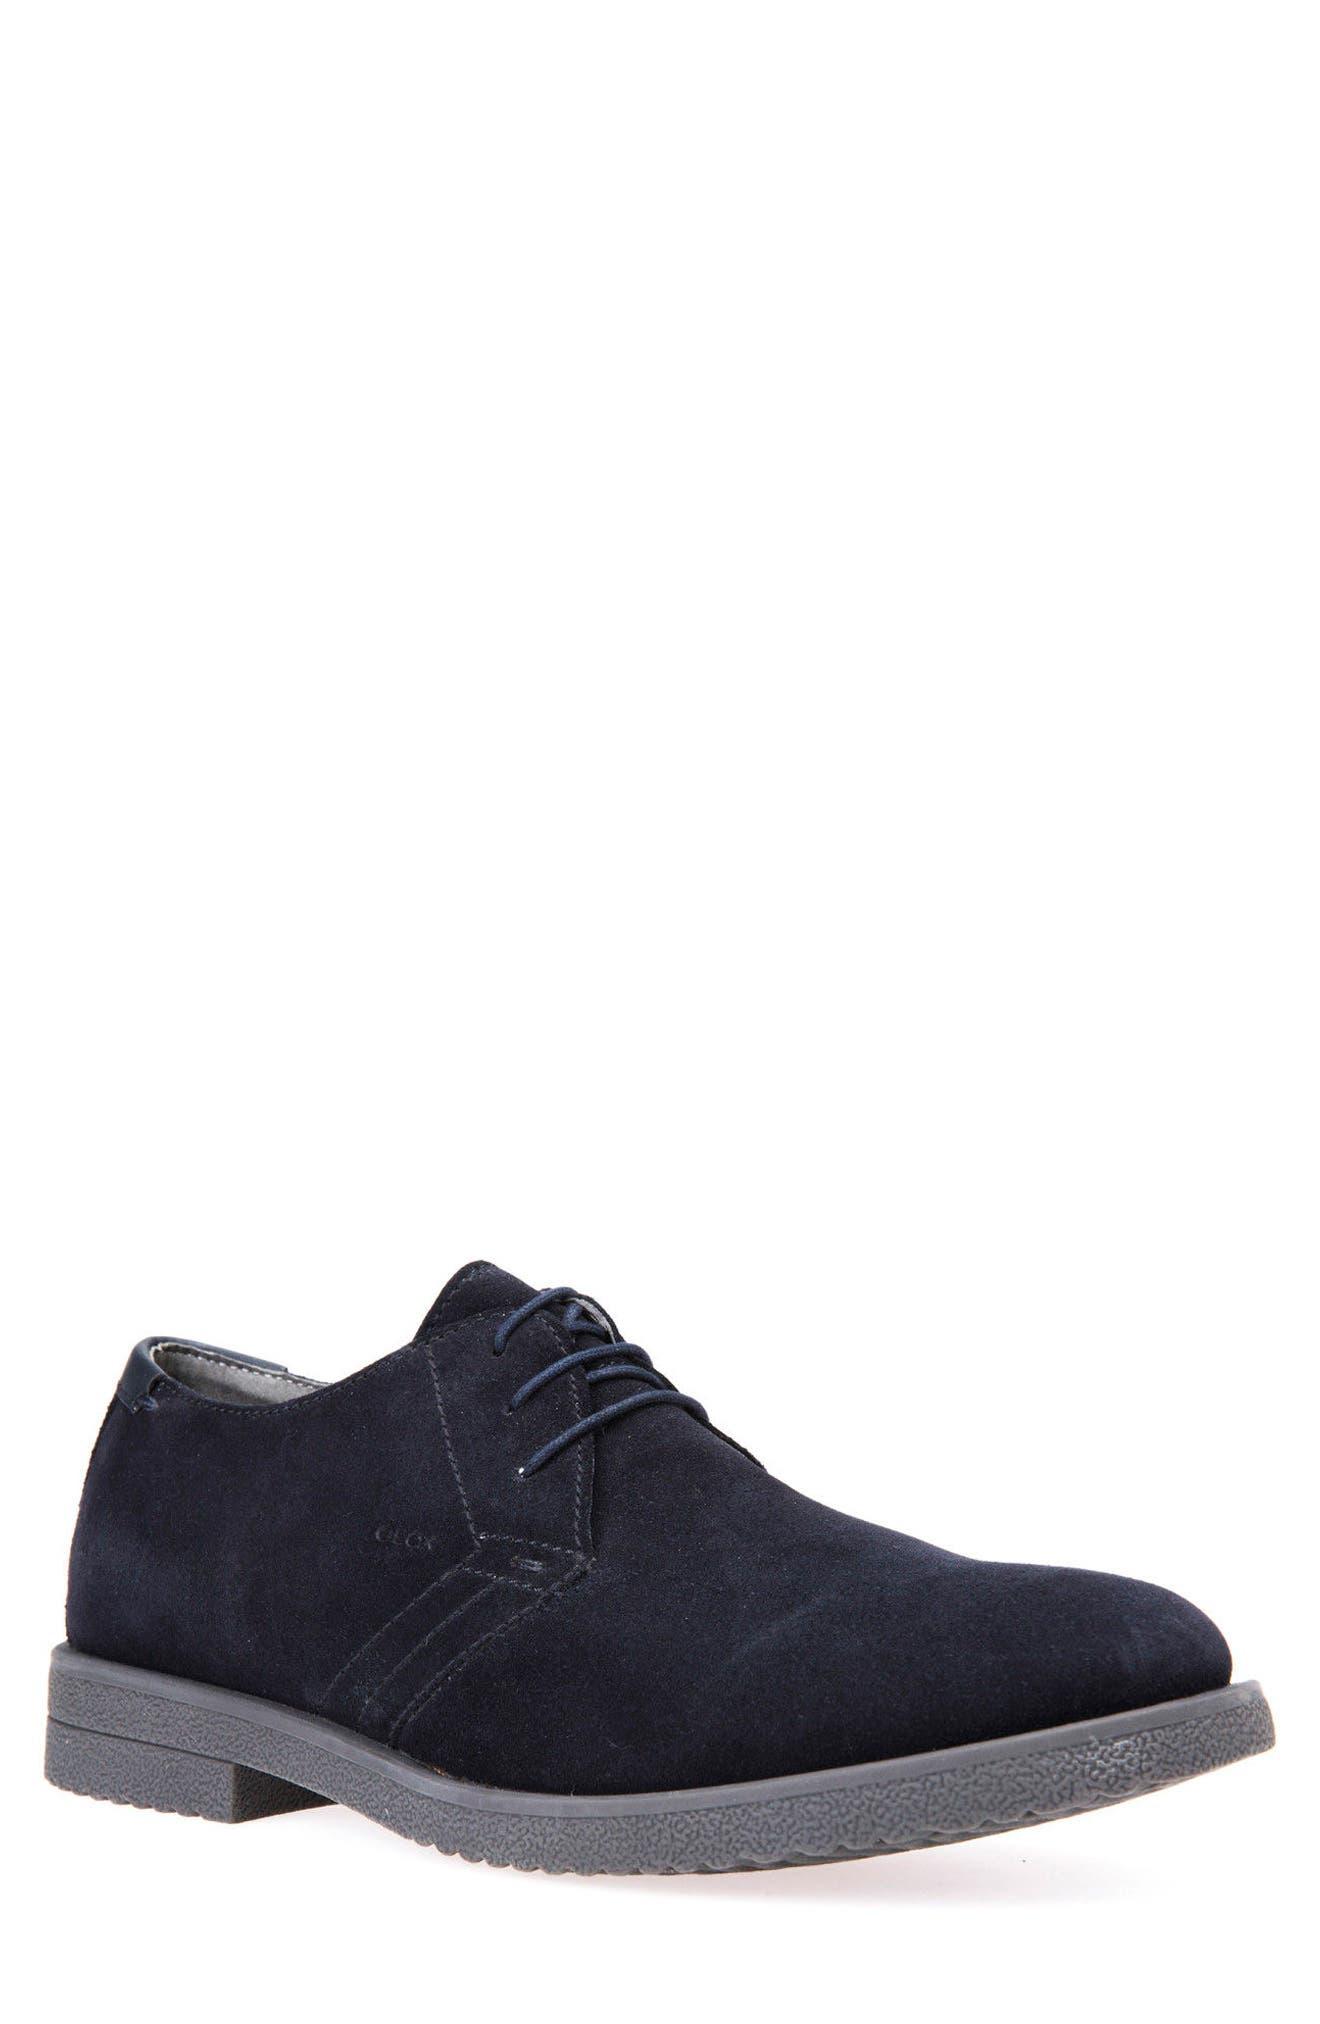 Brandled Buck Shoe,                         Main,                         color,